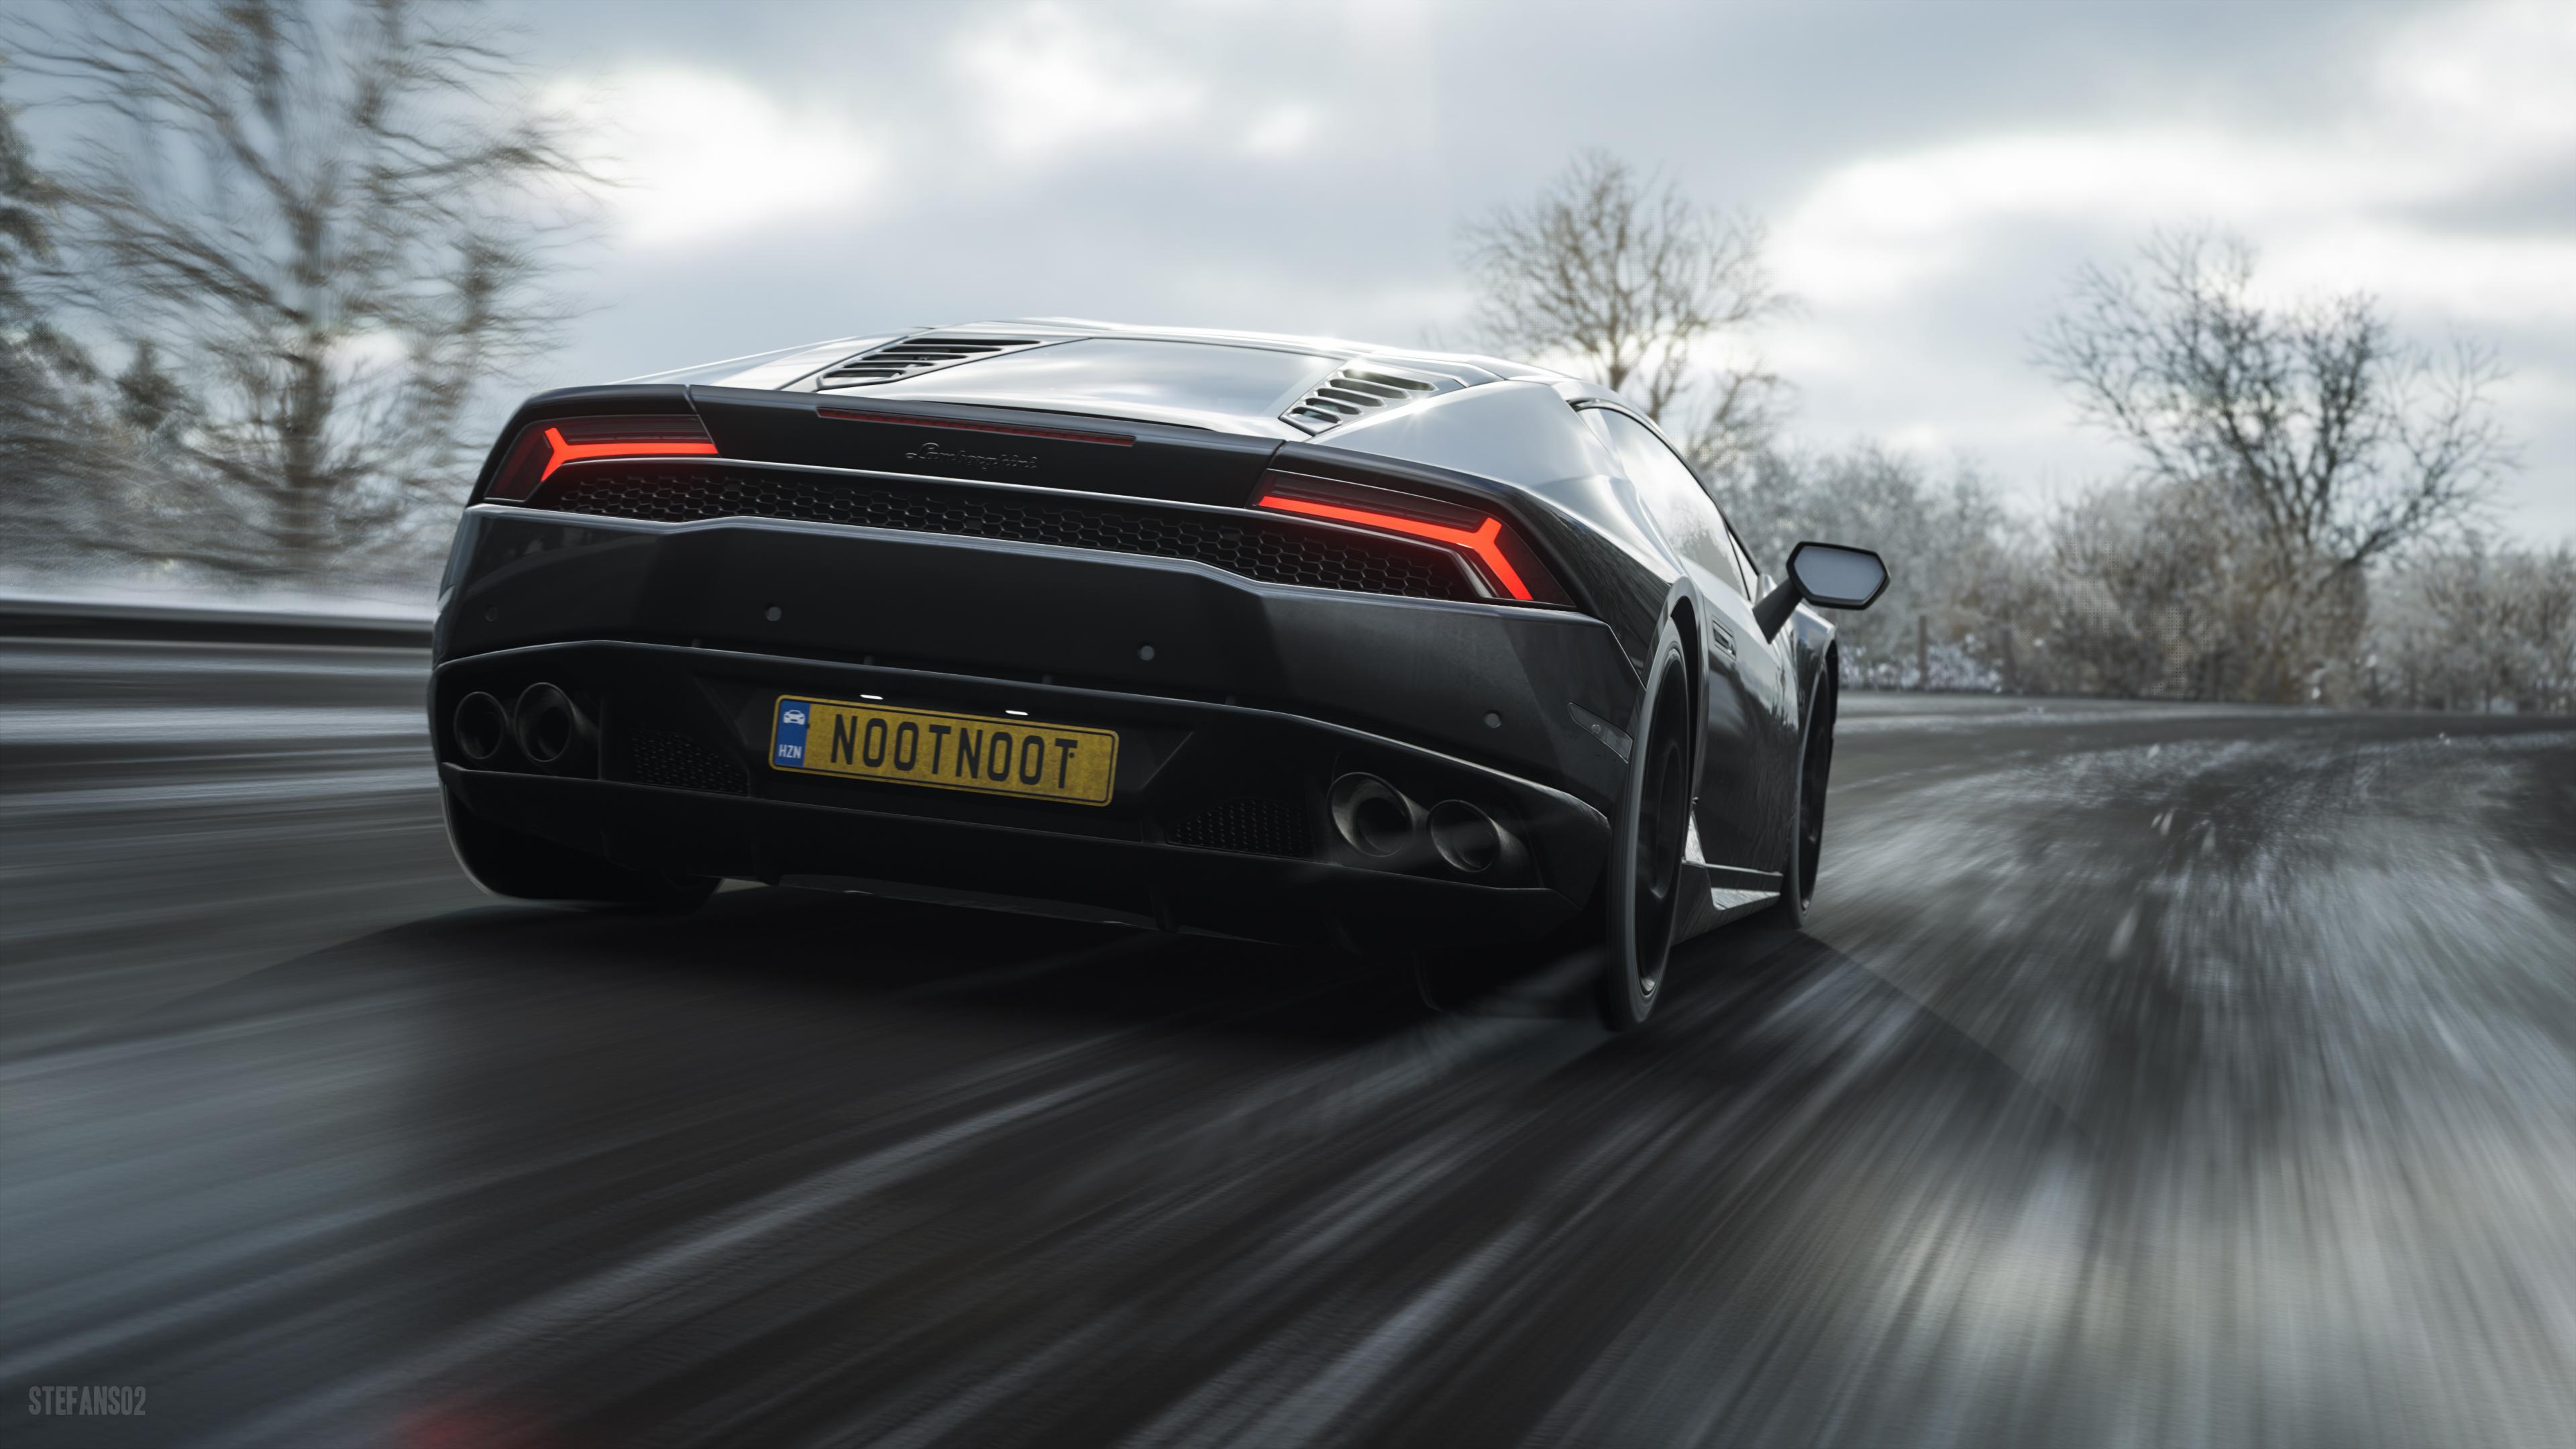 Forza Horizon 4 Wallpaper: Lamborghini Huracan LP 610 Forza Horizon 4, HD Games, 4k